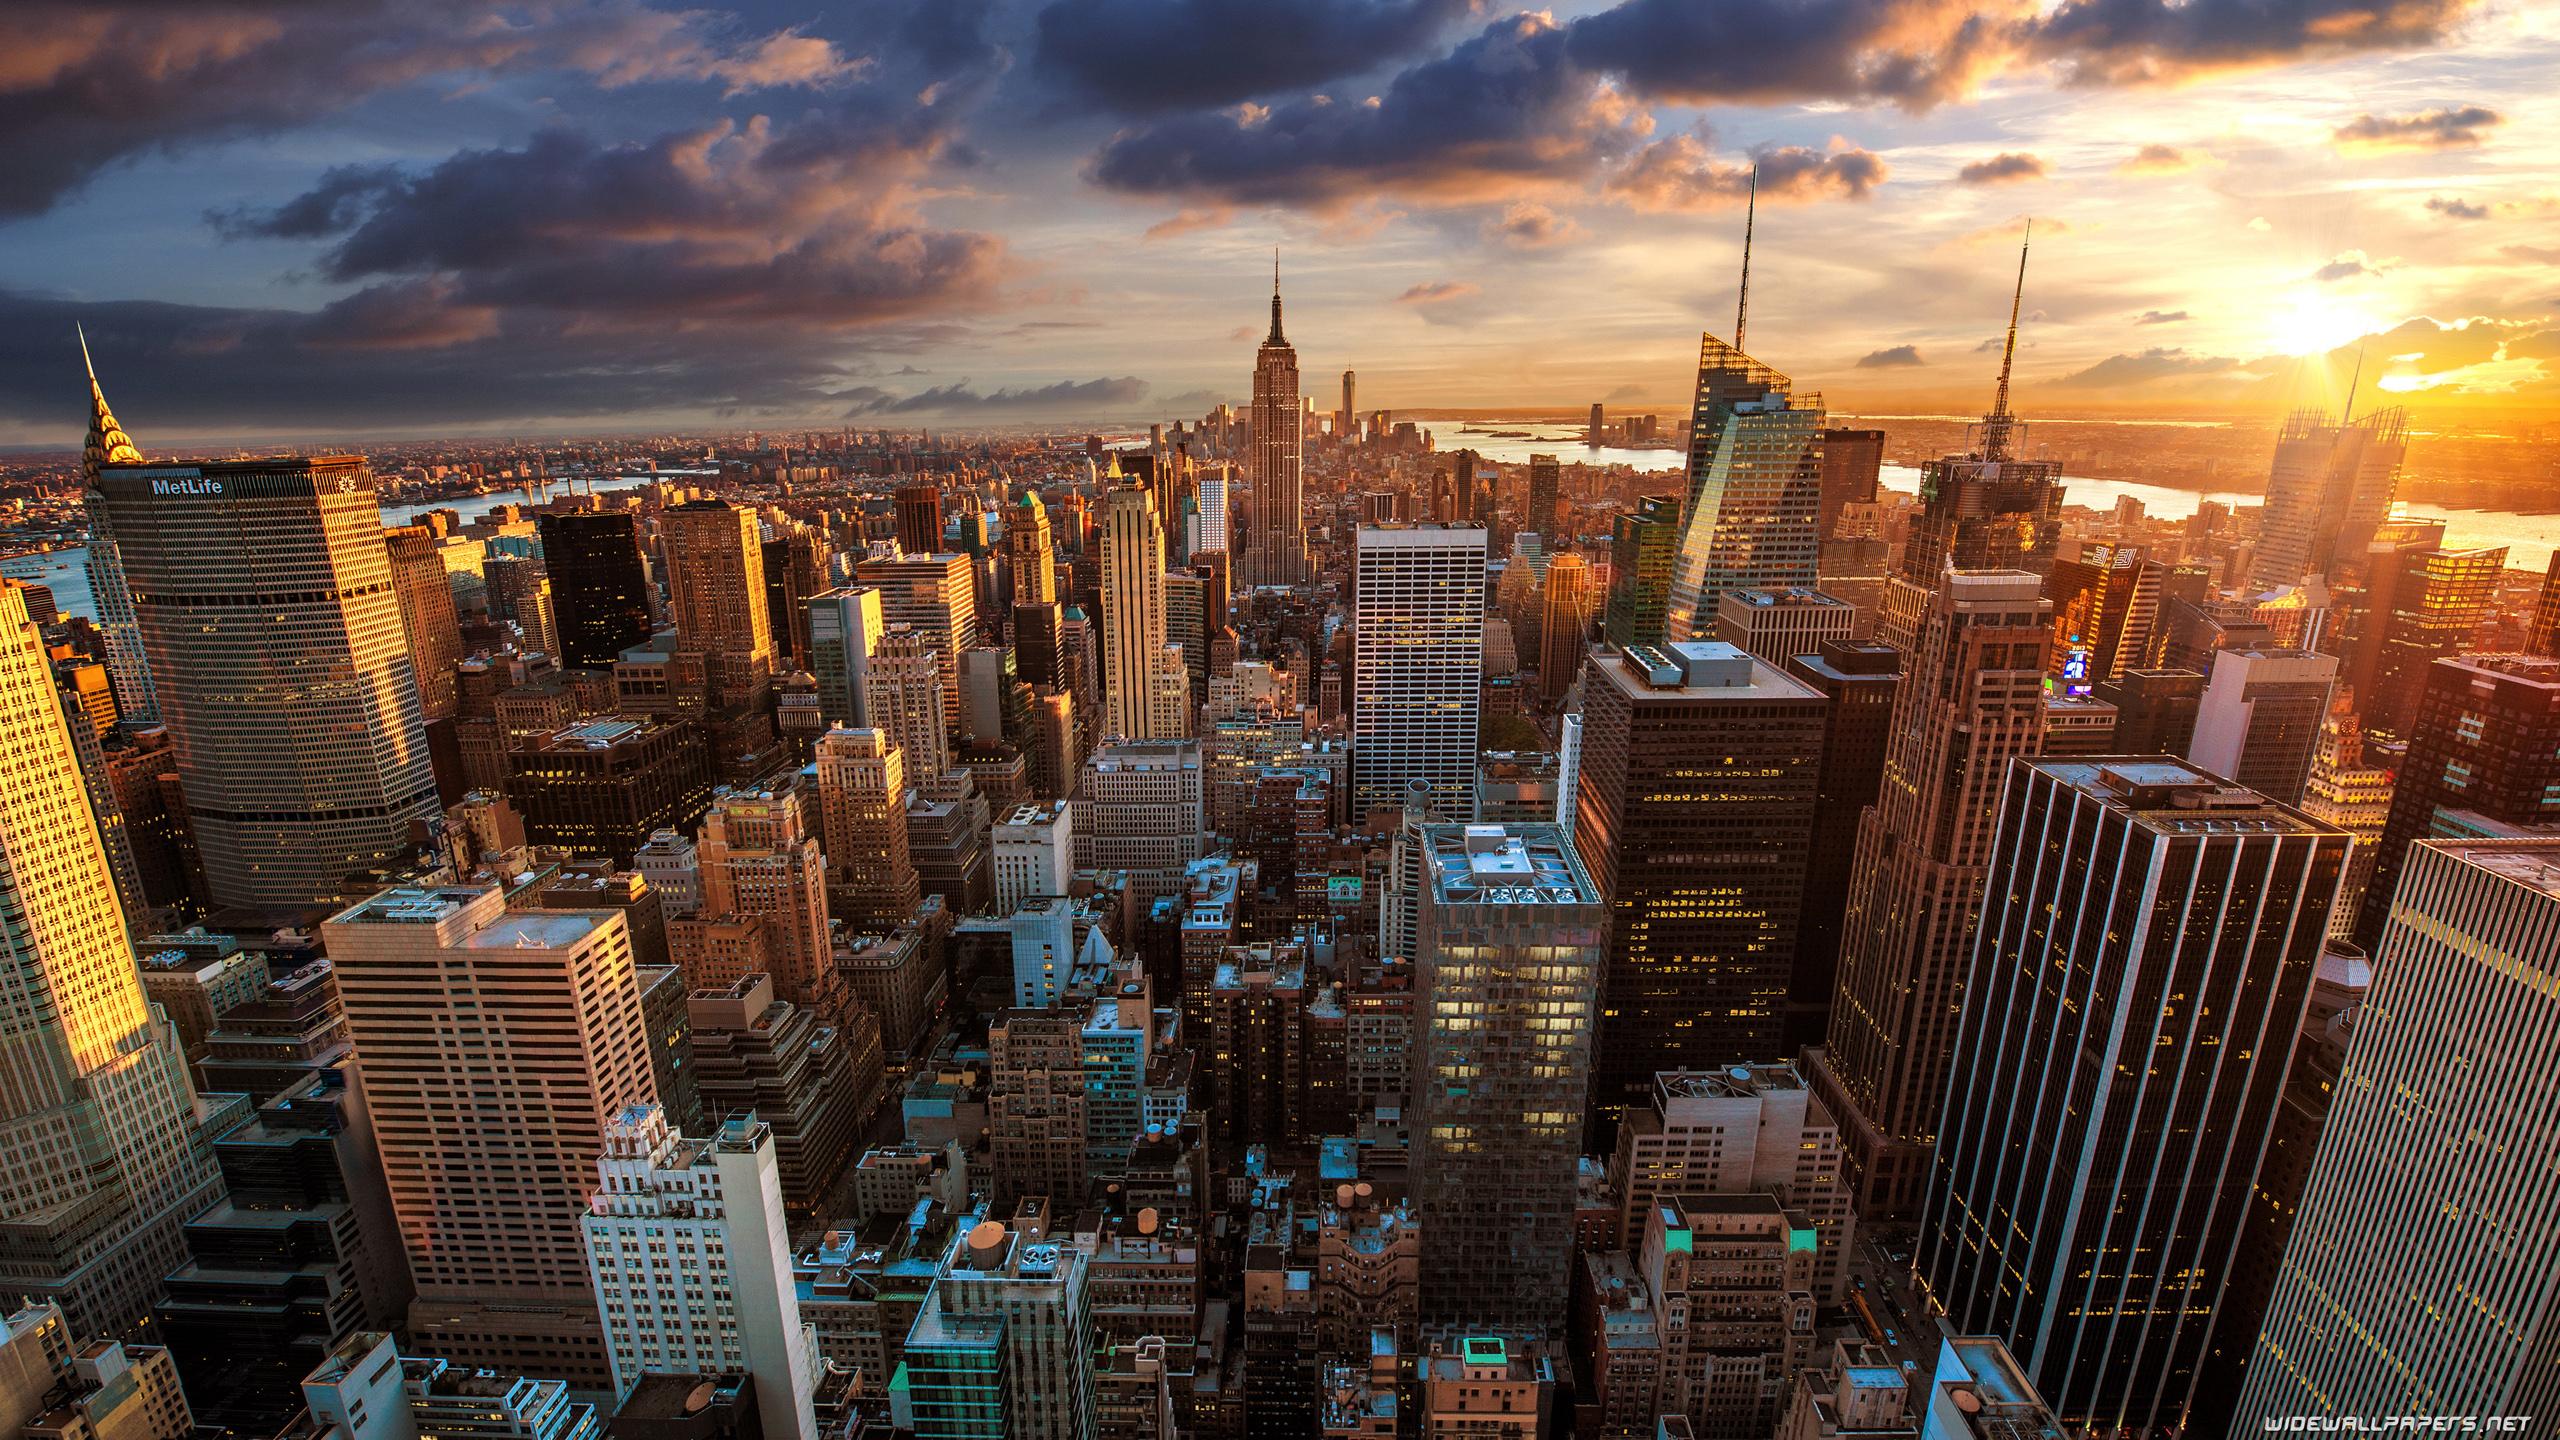 New York desktop wallpapers 4K Ultra HD